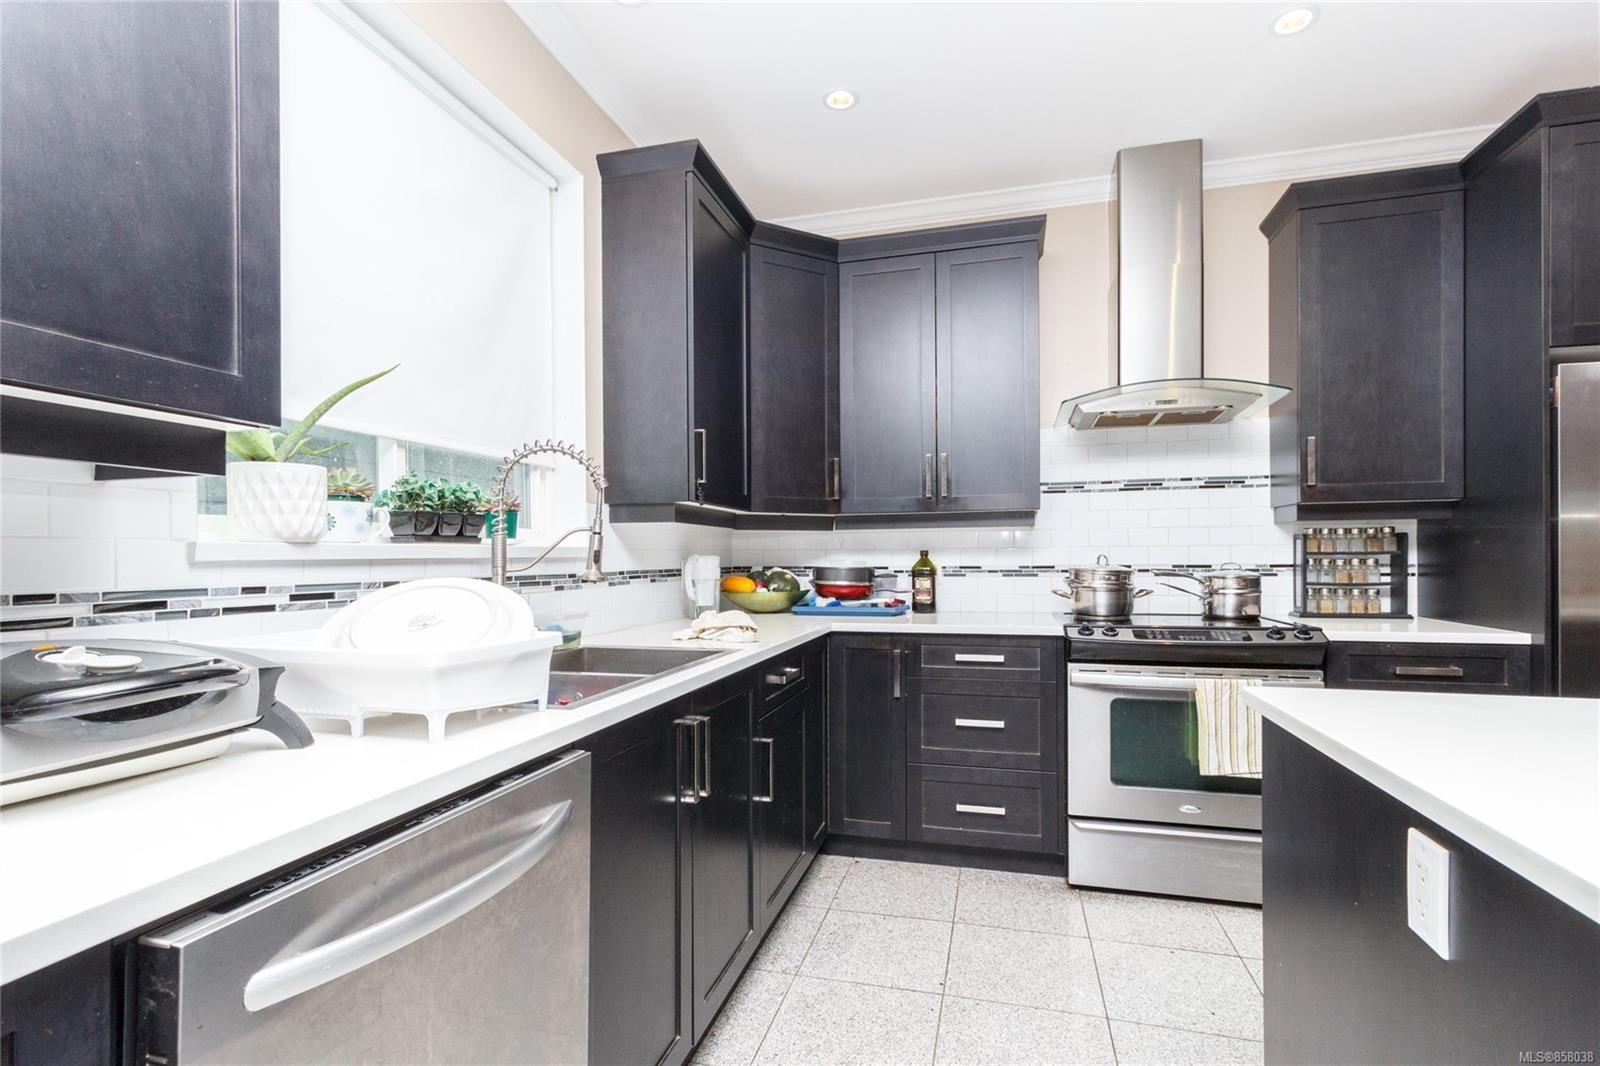 Main Photo: 558 Bezanton Way in : Co Latoria House for sale (Colwood)  : MLS®# 858038